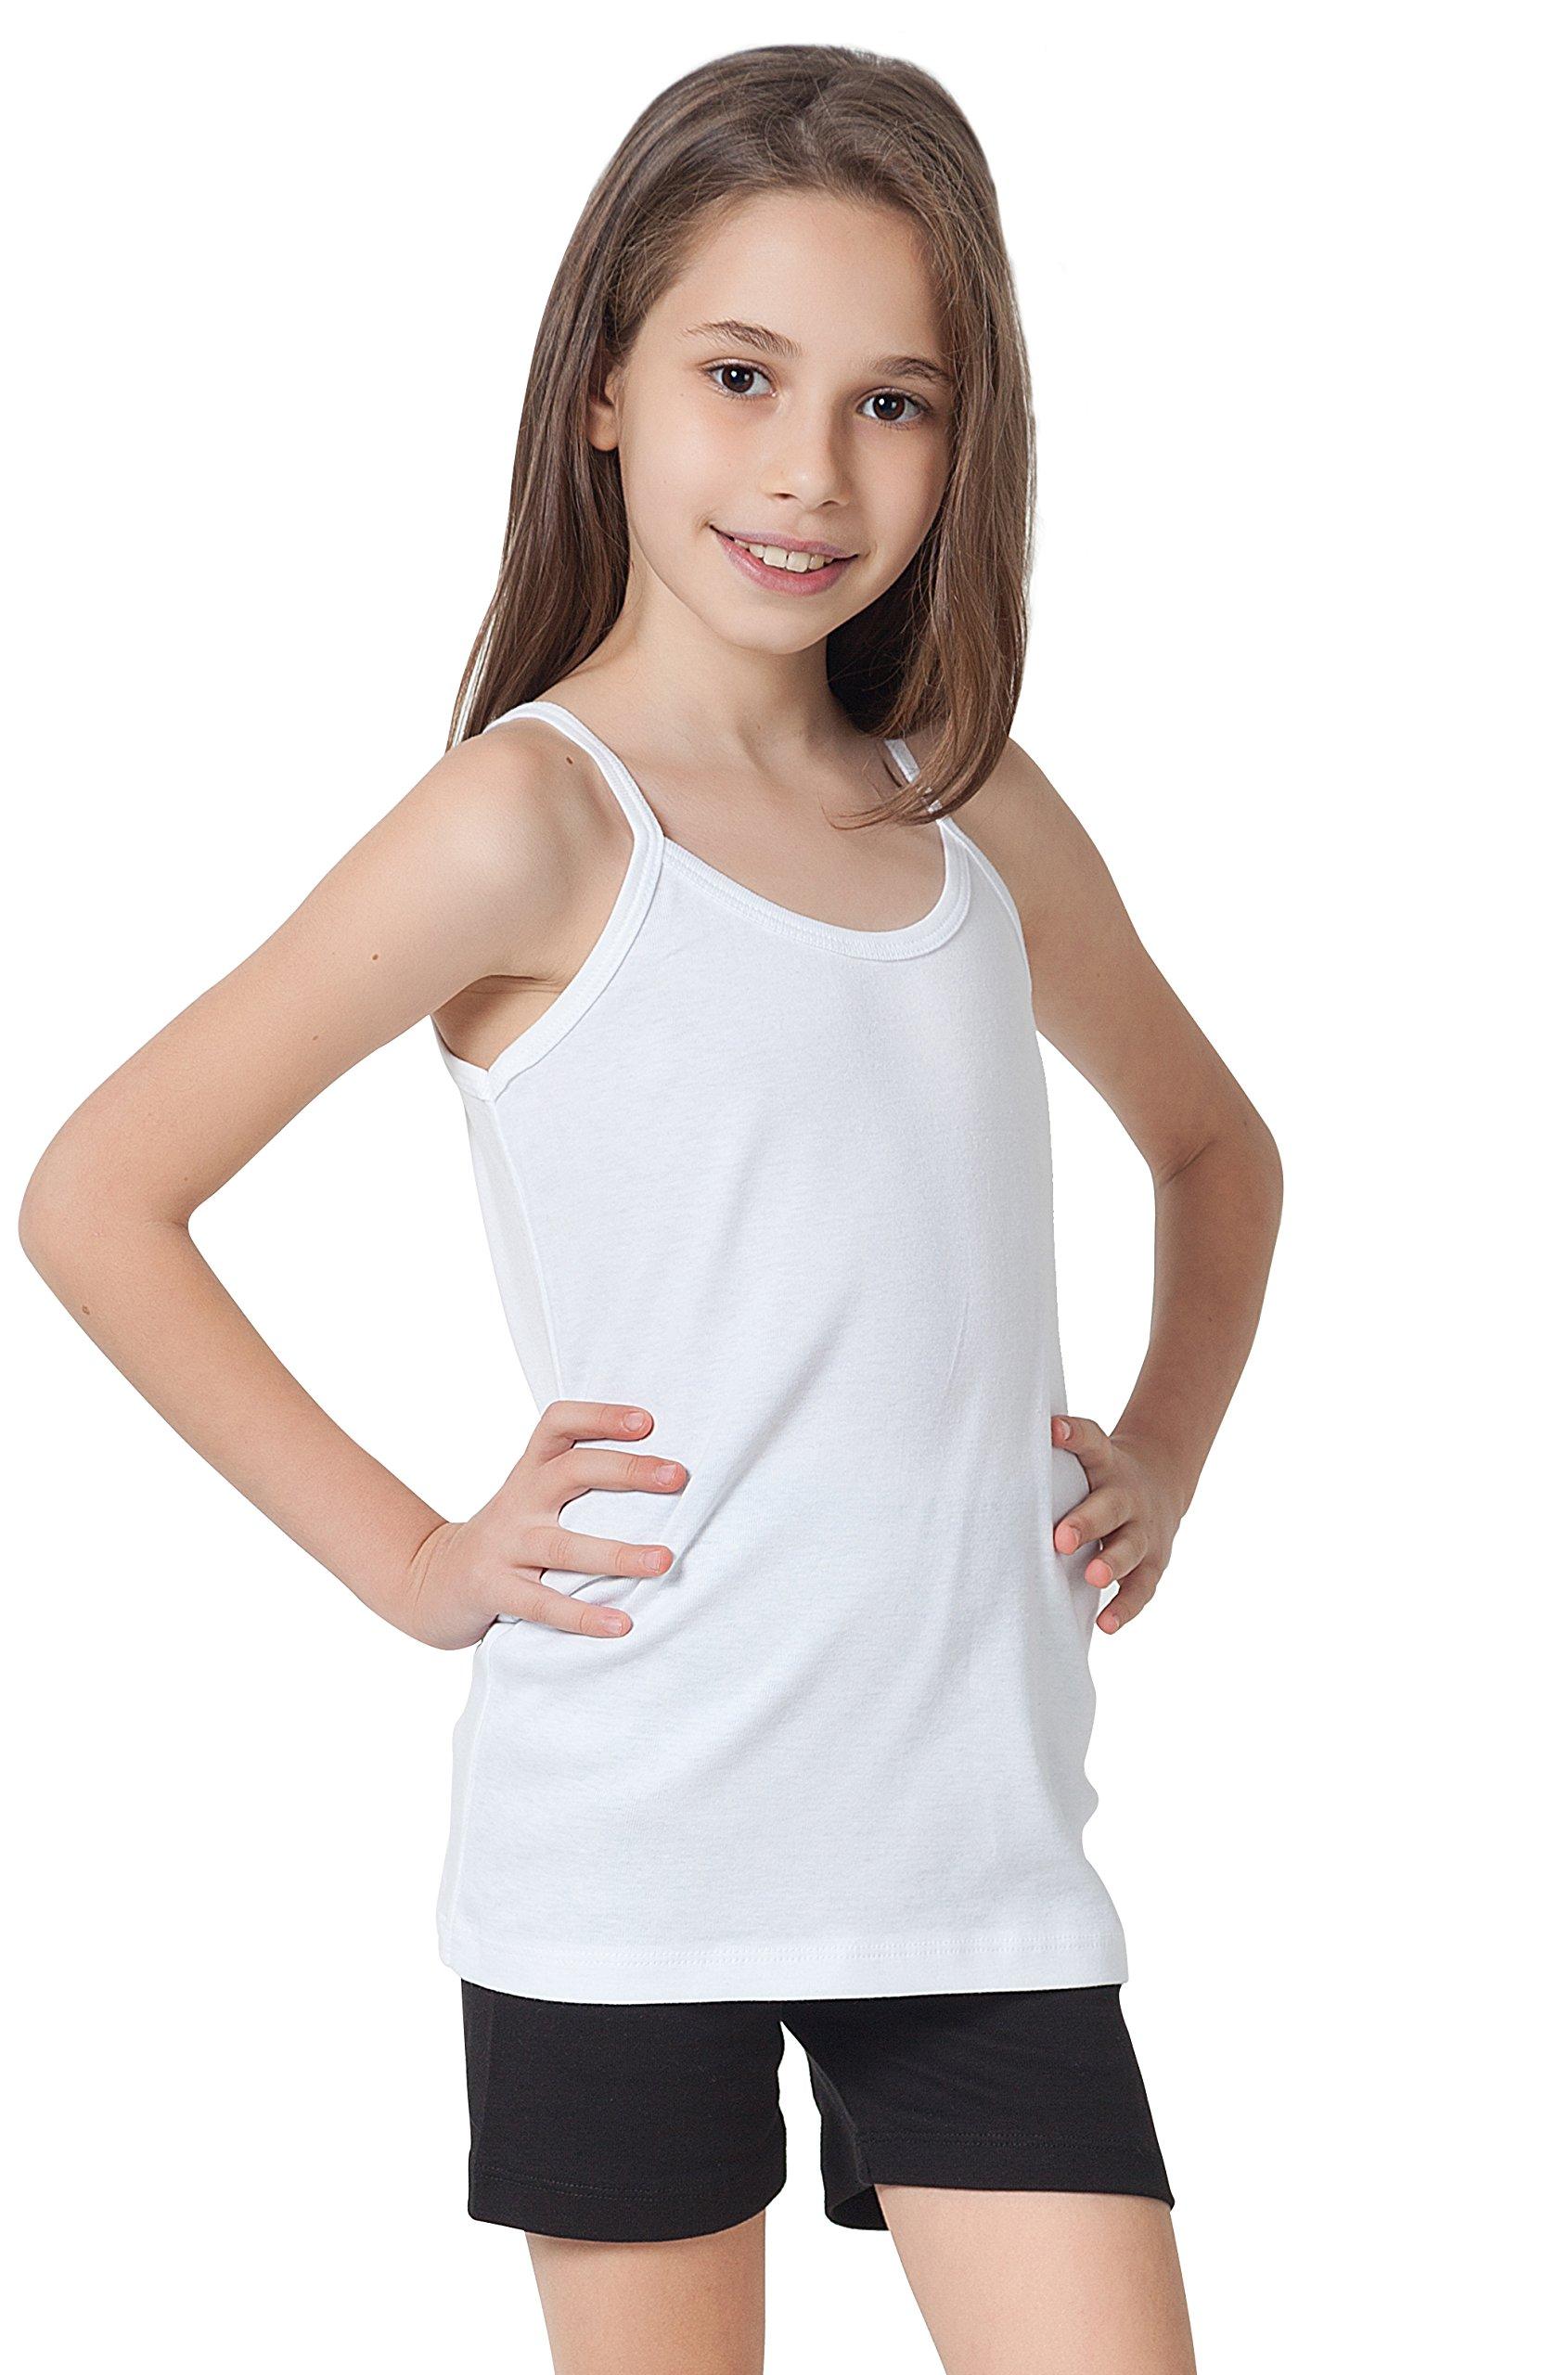 CAOMP Girls Camisole%100 Organic Cotton Undershirt Tank Tee Top (Pack of 2) (11-12, White-White)